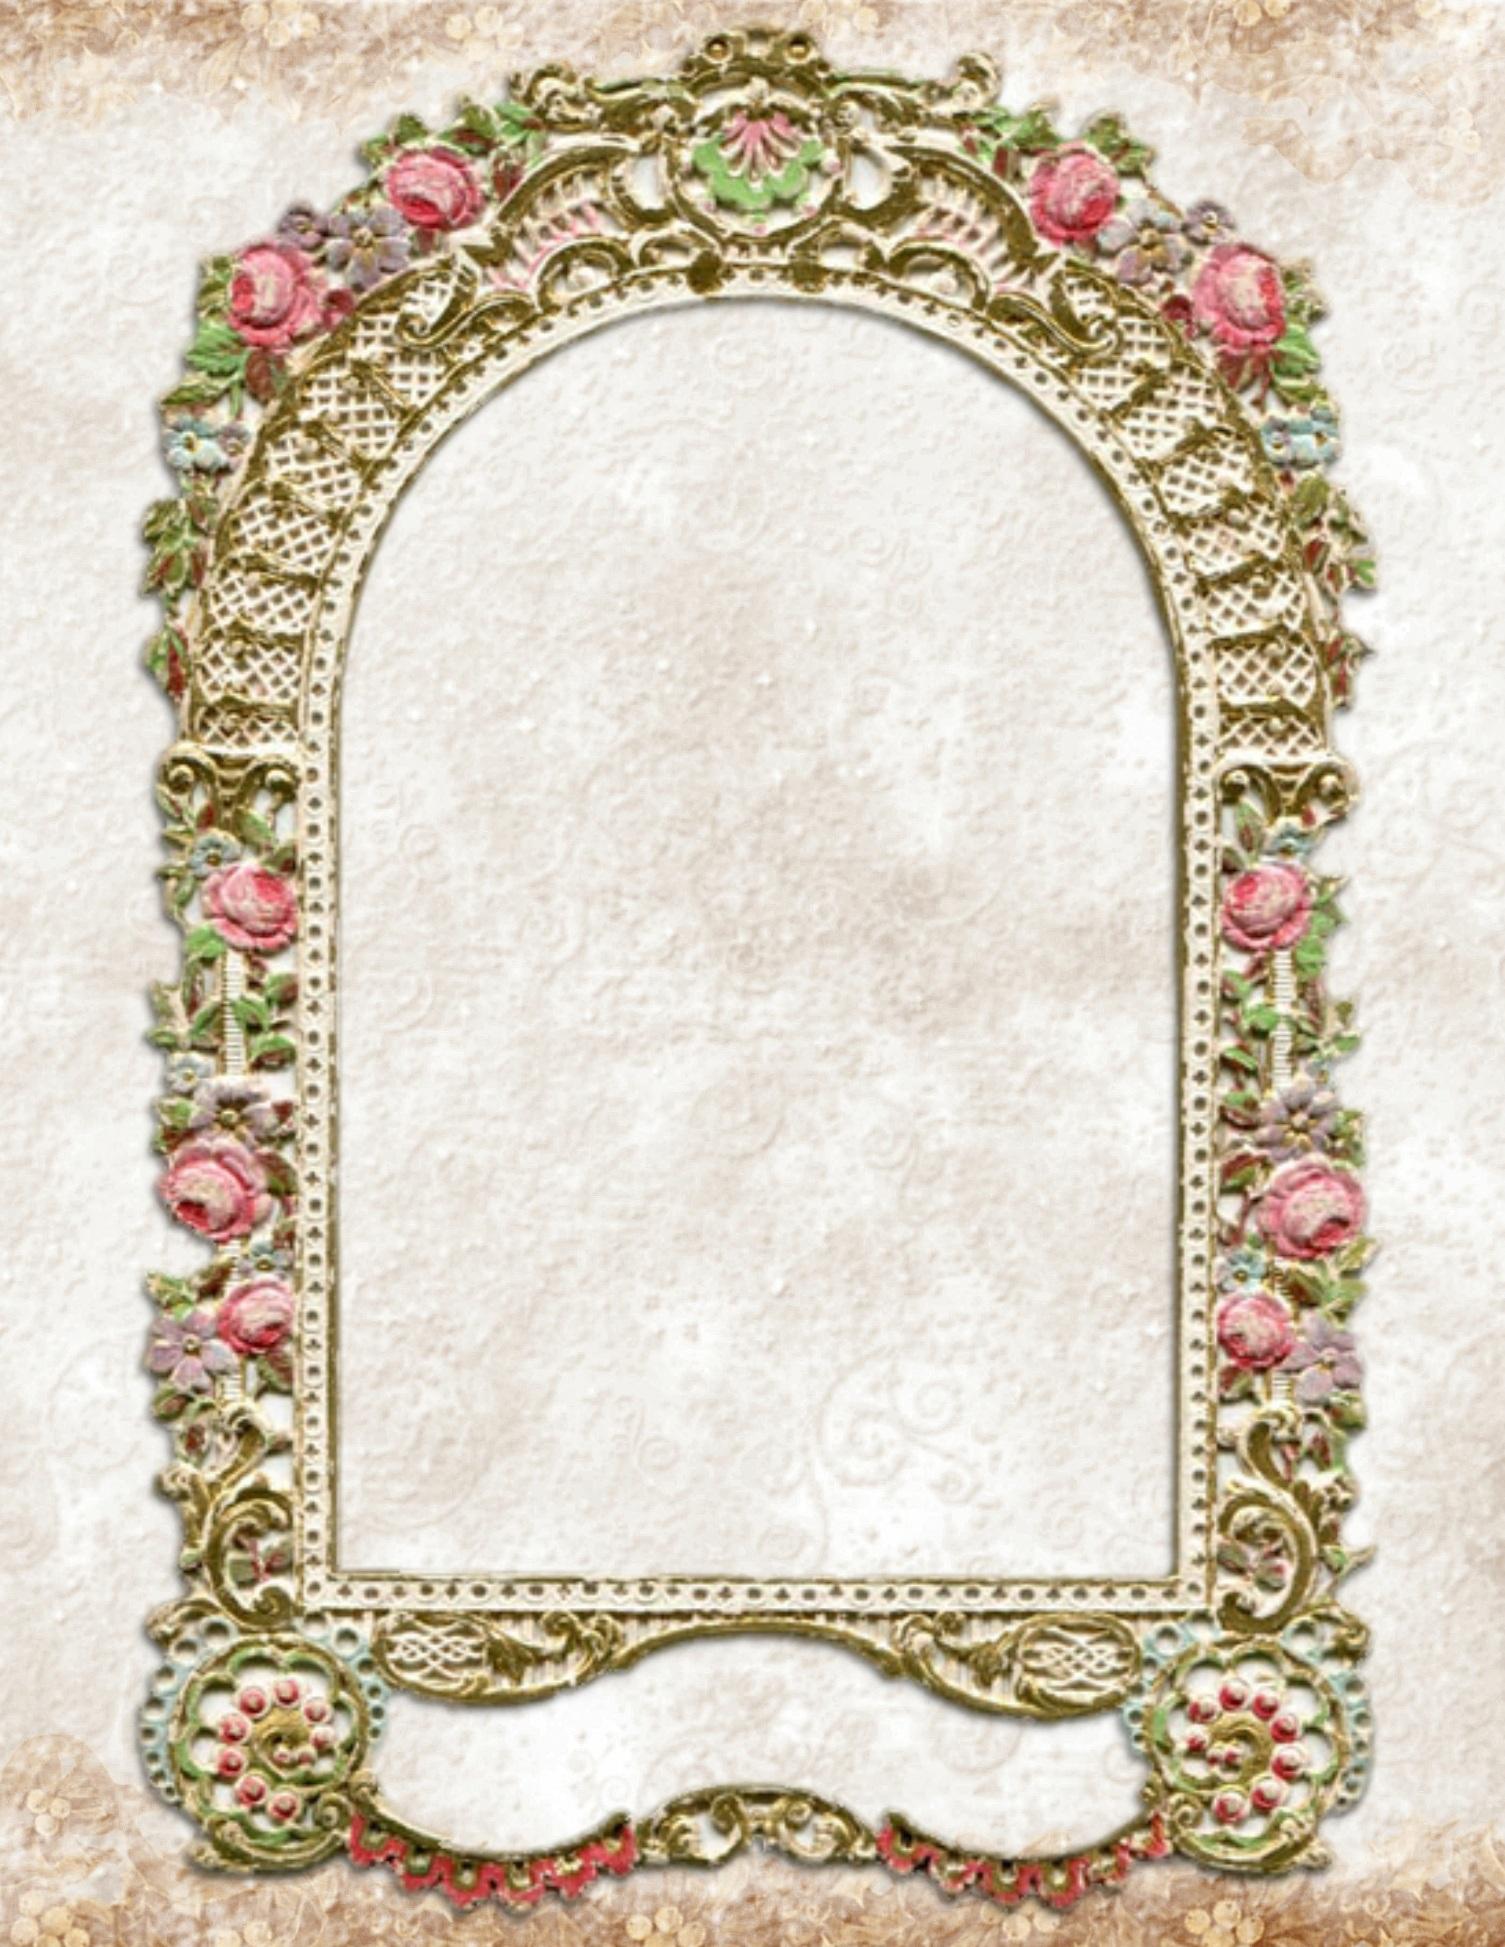 ornate-1171142